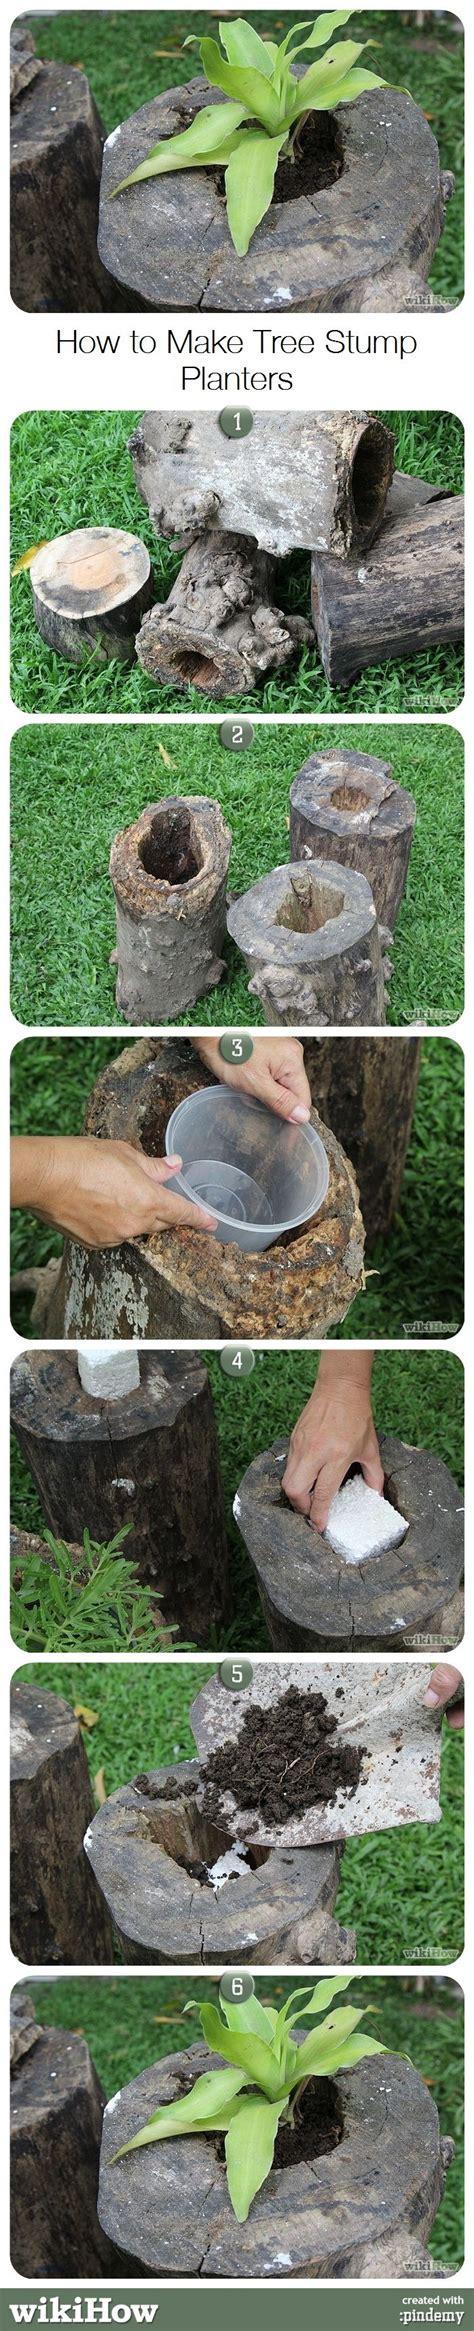 how to make planters how to make tree stump planters ikea decora